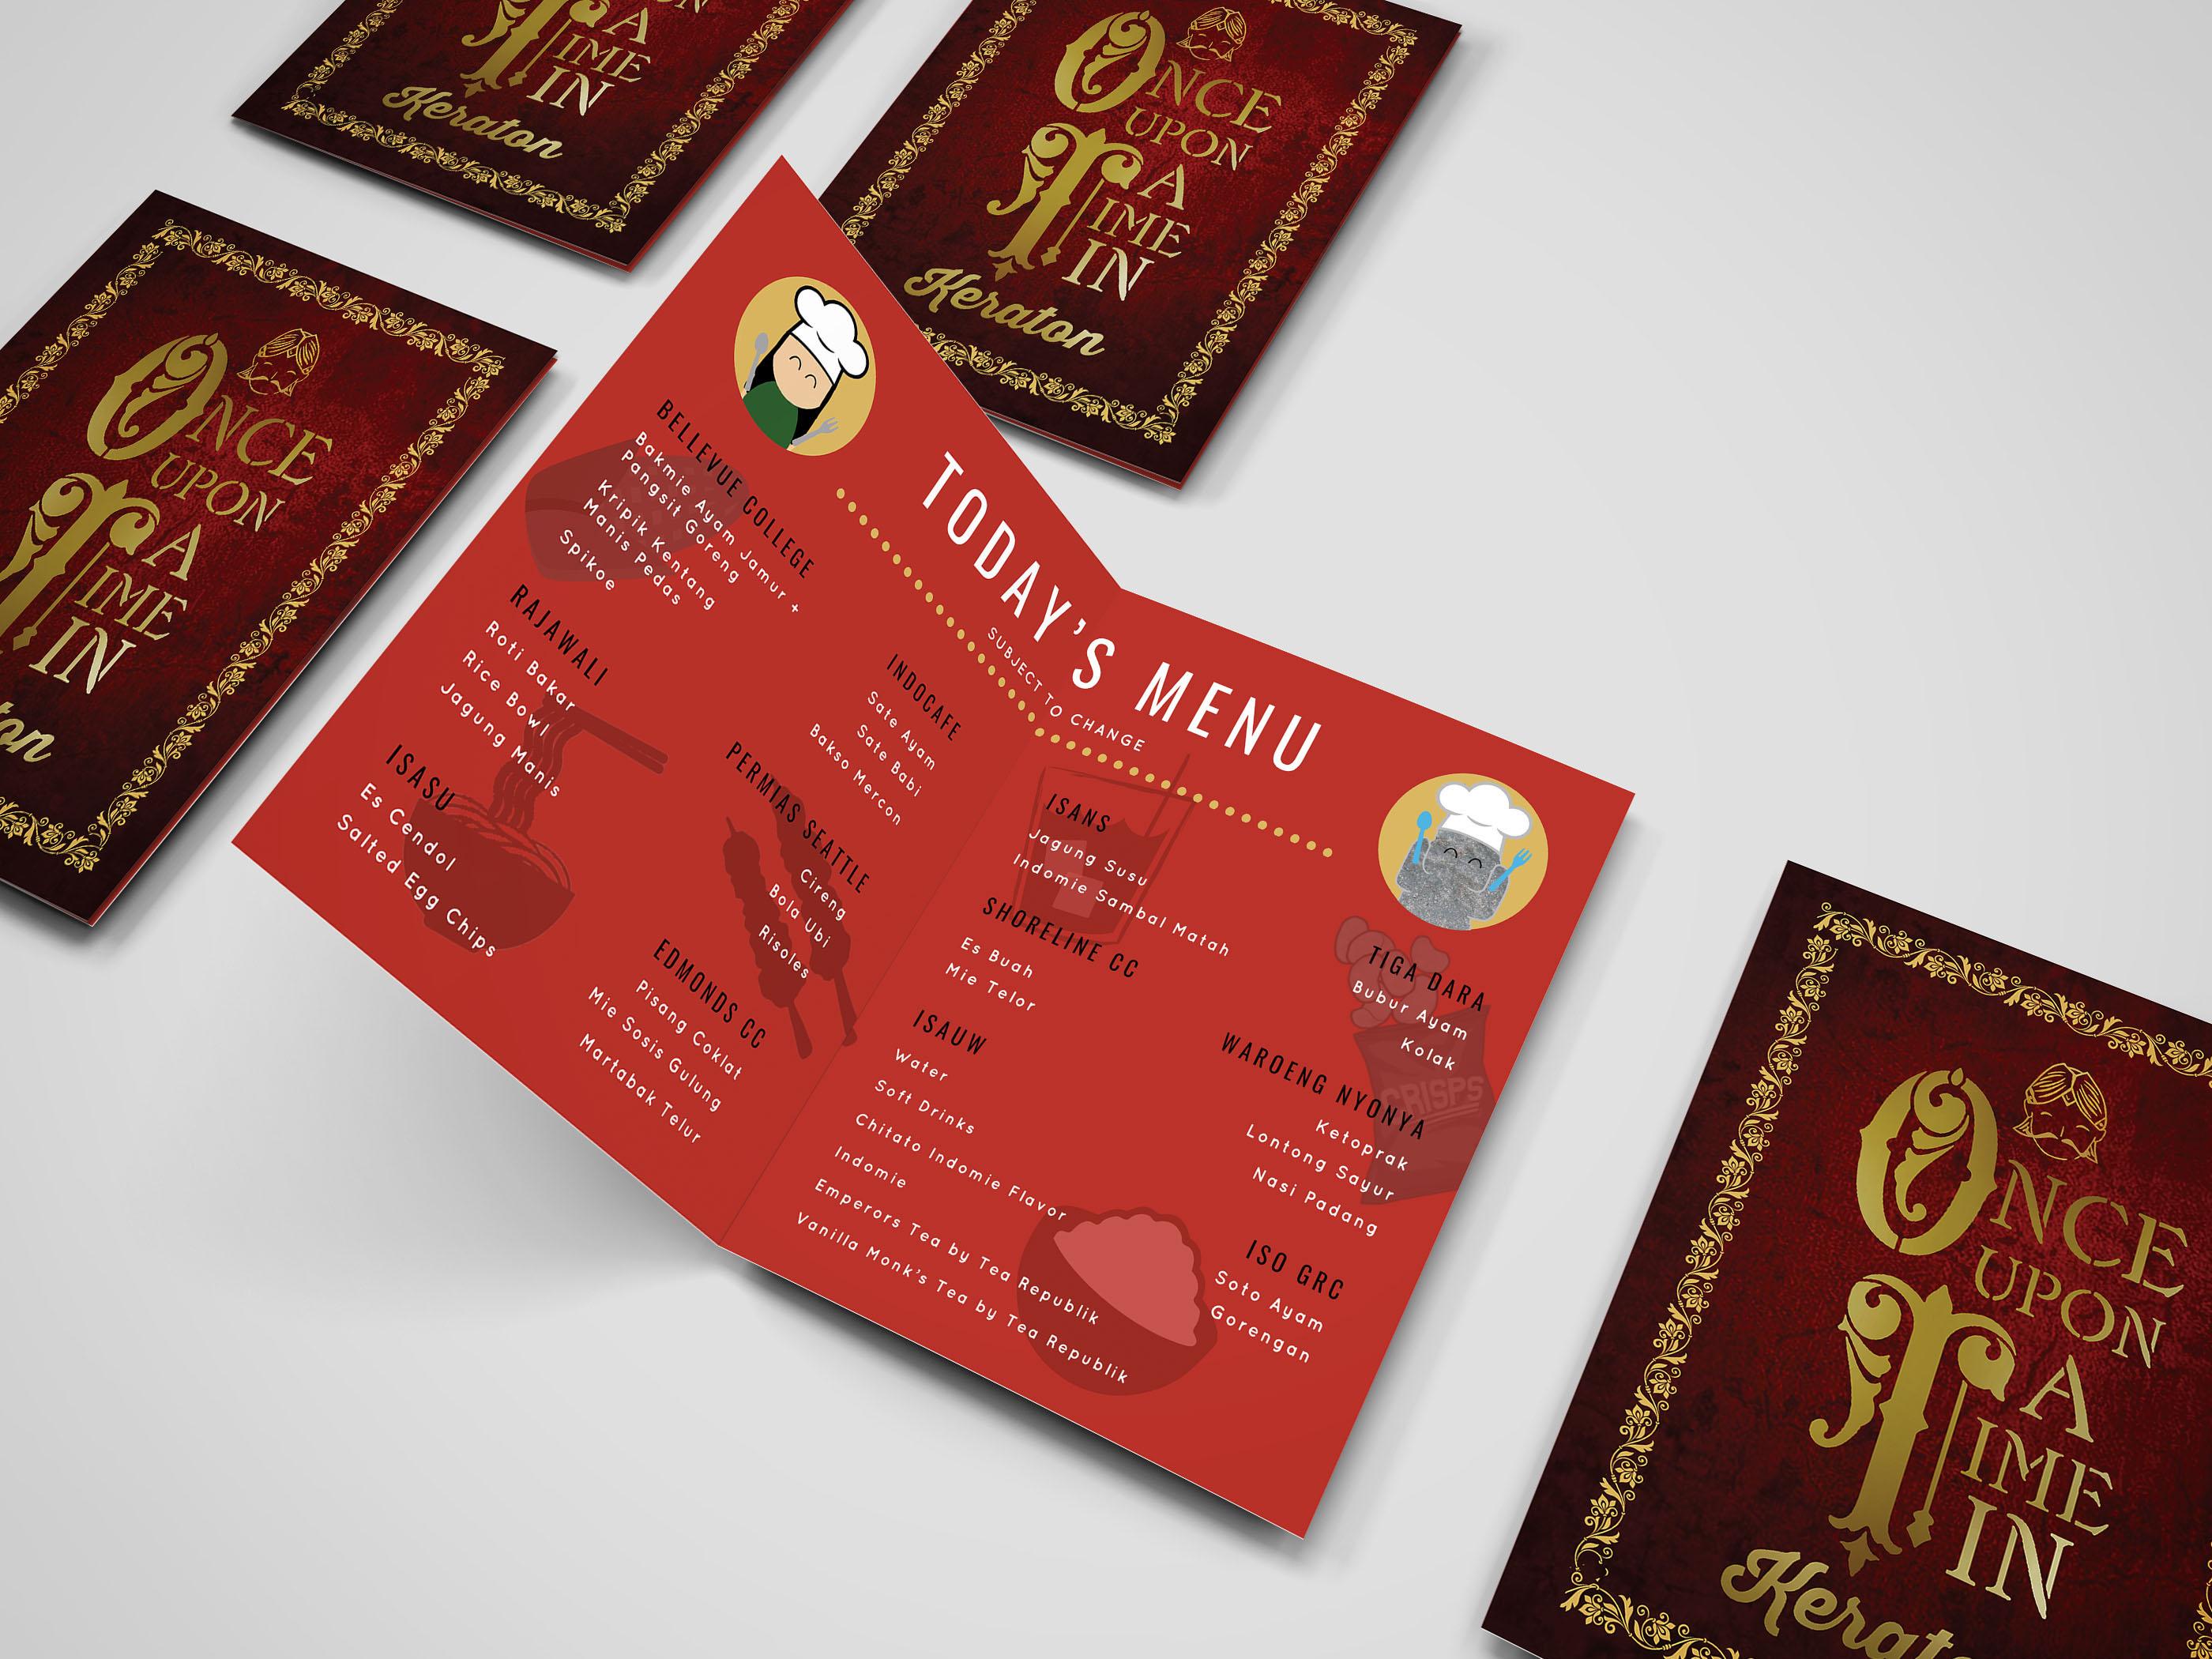 Promo Harga Mie Telur Cap 3 Ayam Terbaru 2018 Produk Ukm Bumn Tas Phiton Kombinasi Coklat Krem Keraton On Behance